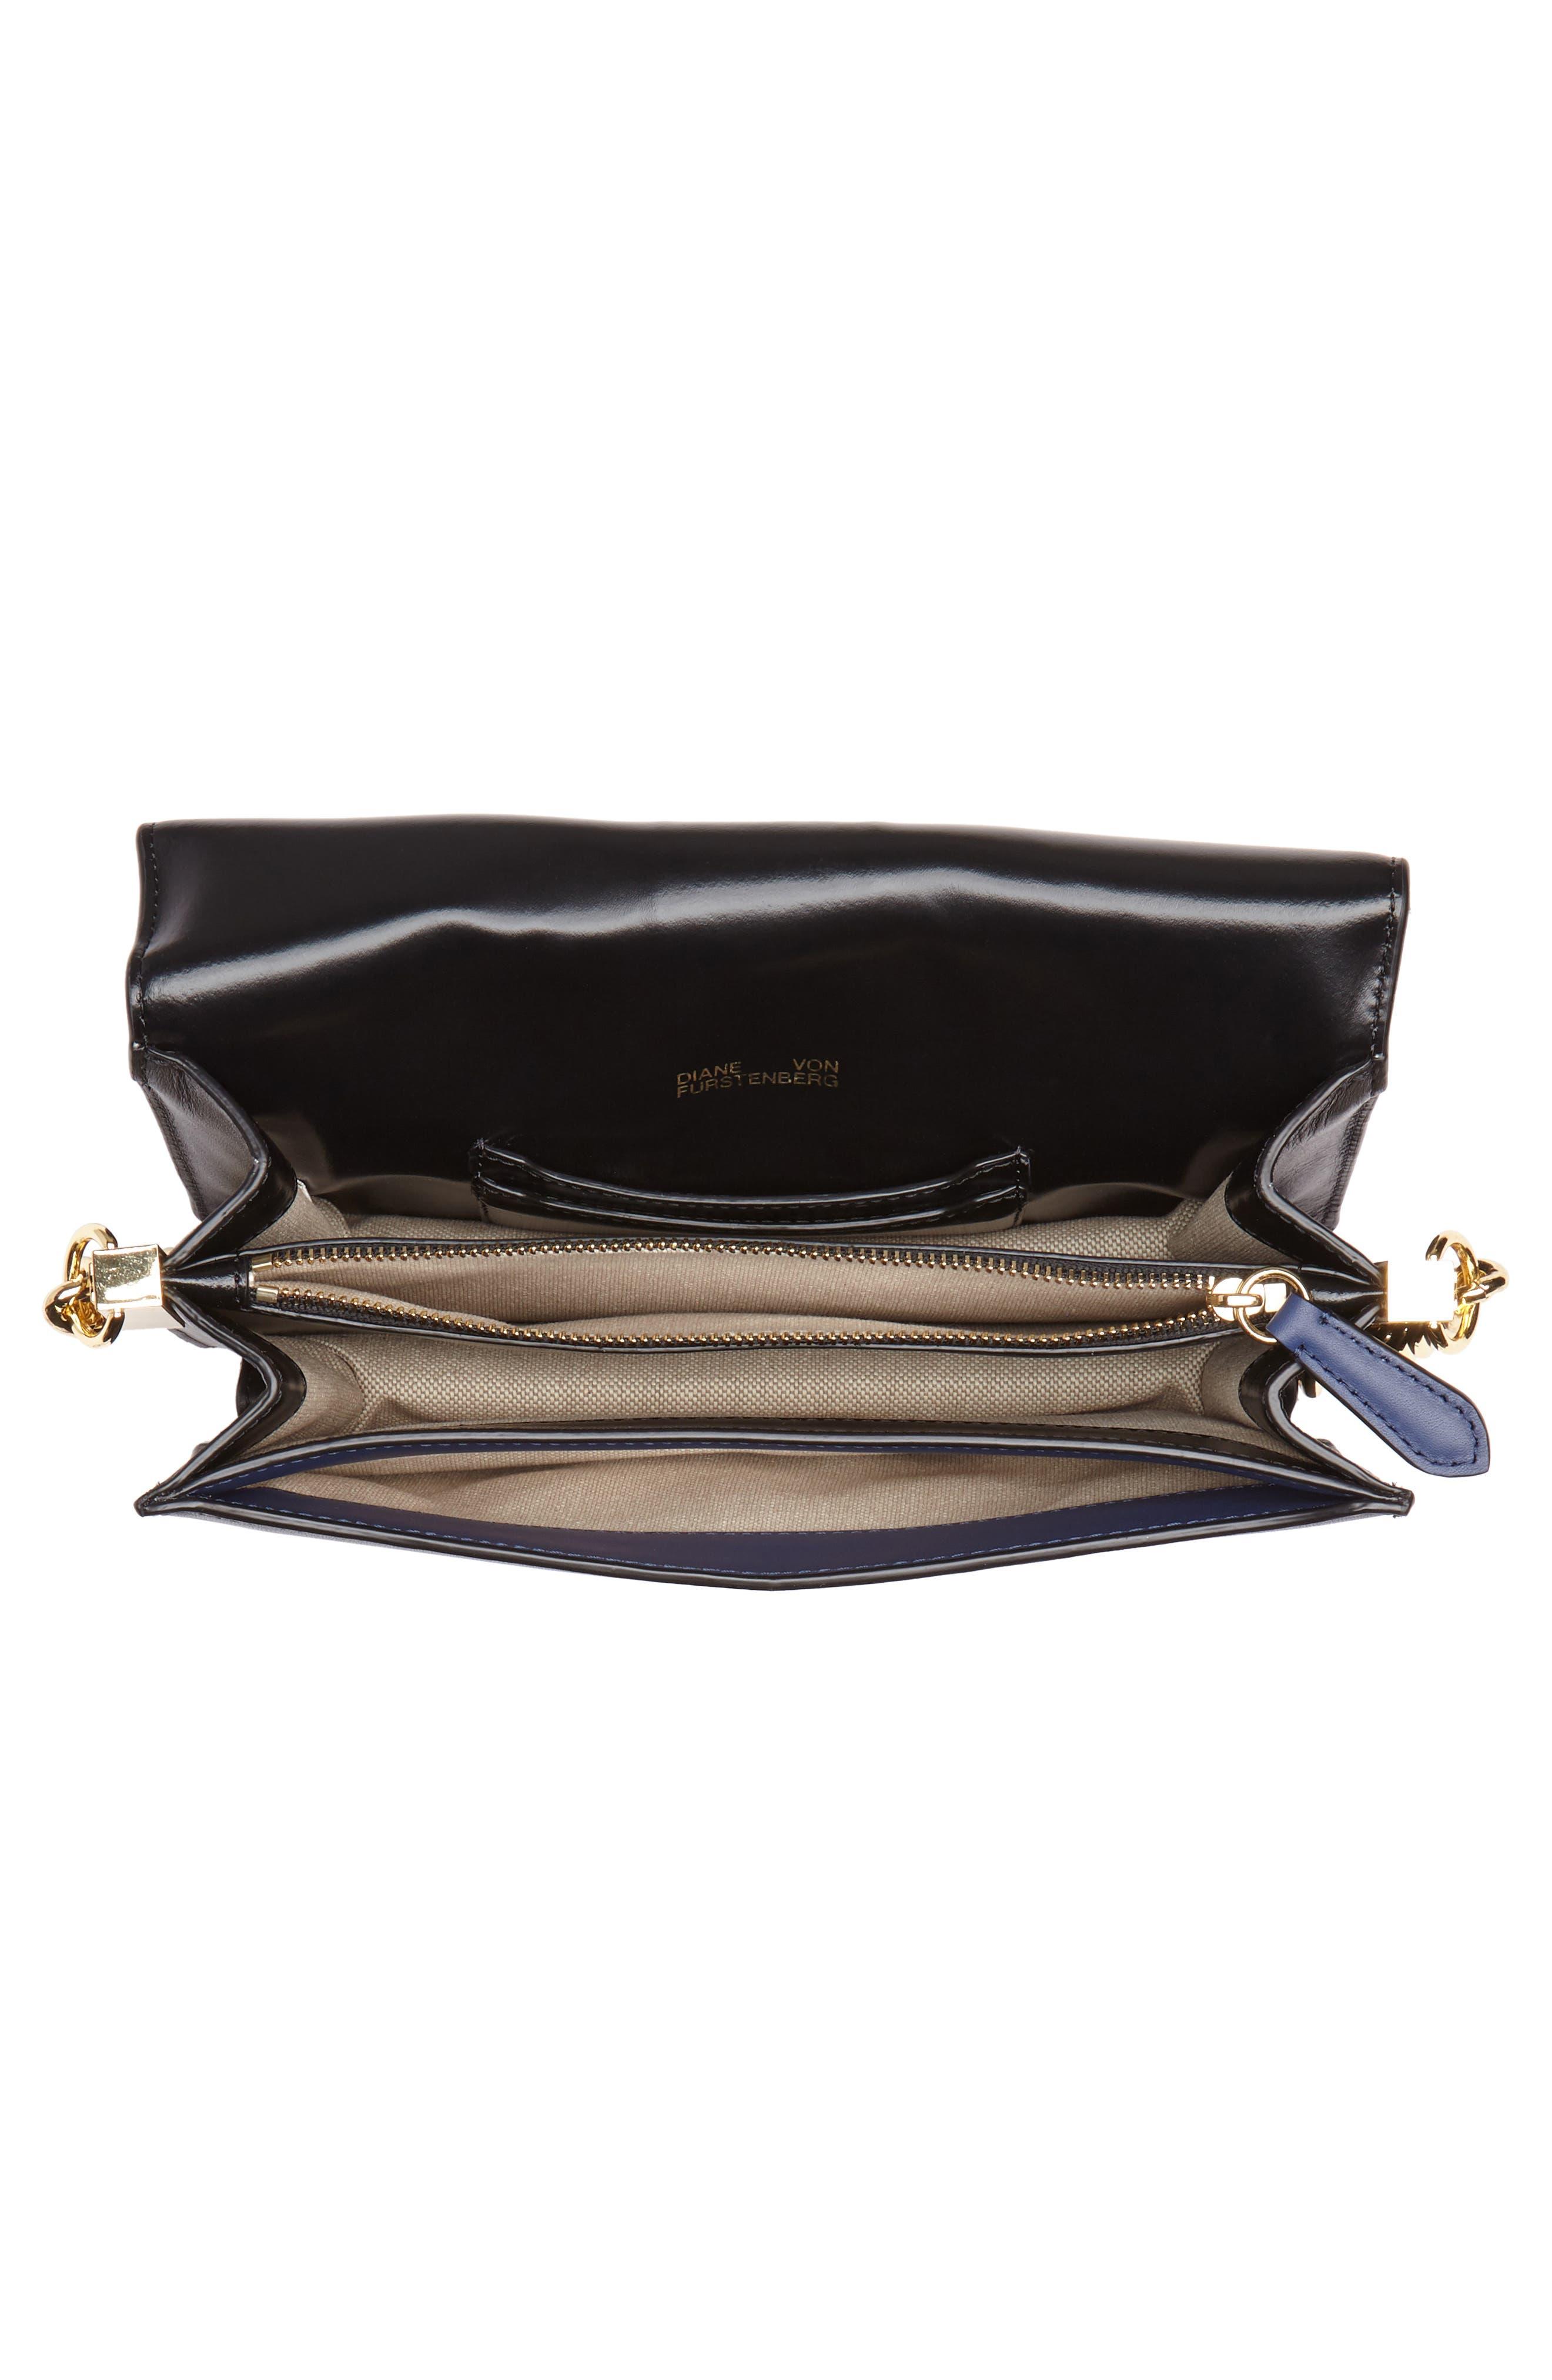 Bonne Journée Half Moon Leather Crossbody Bag,                             Alternate thumbnail 4, color,                             Harlow Black